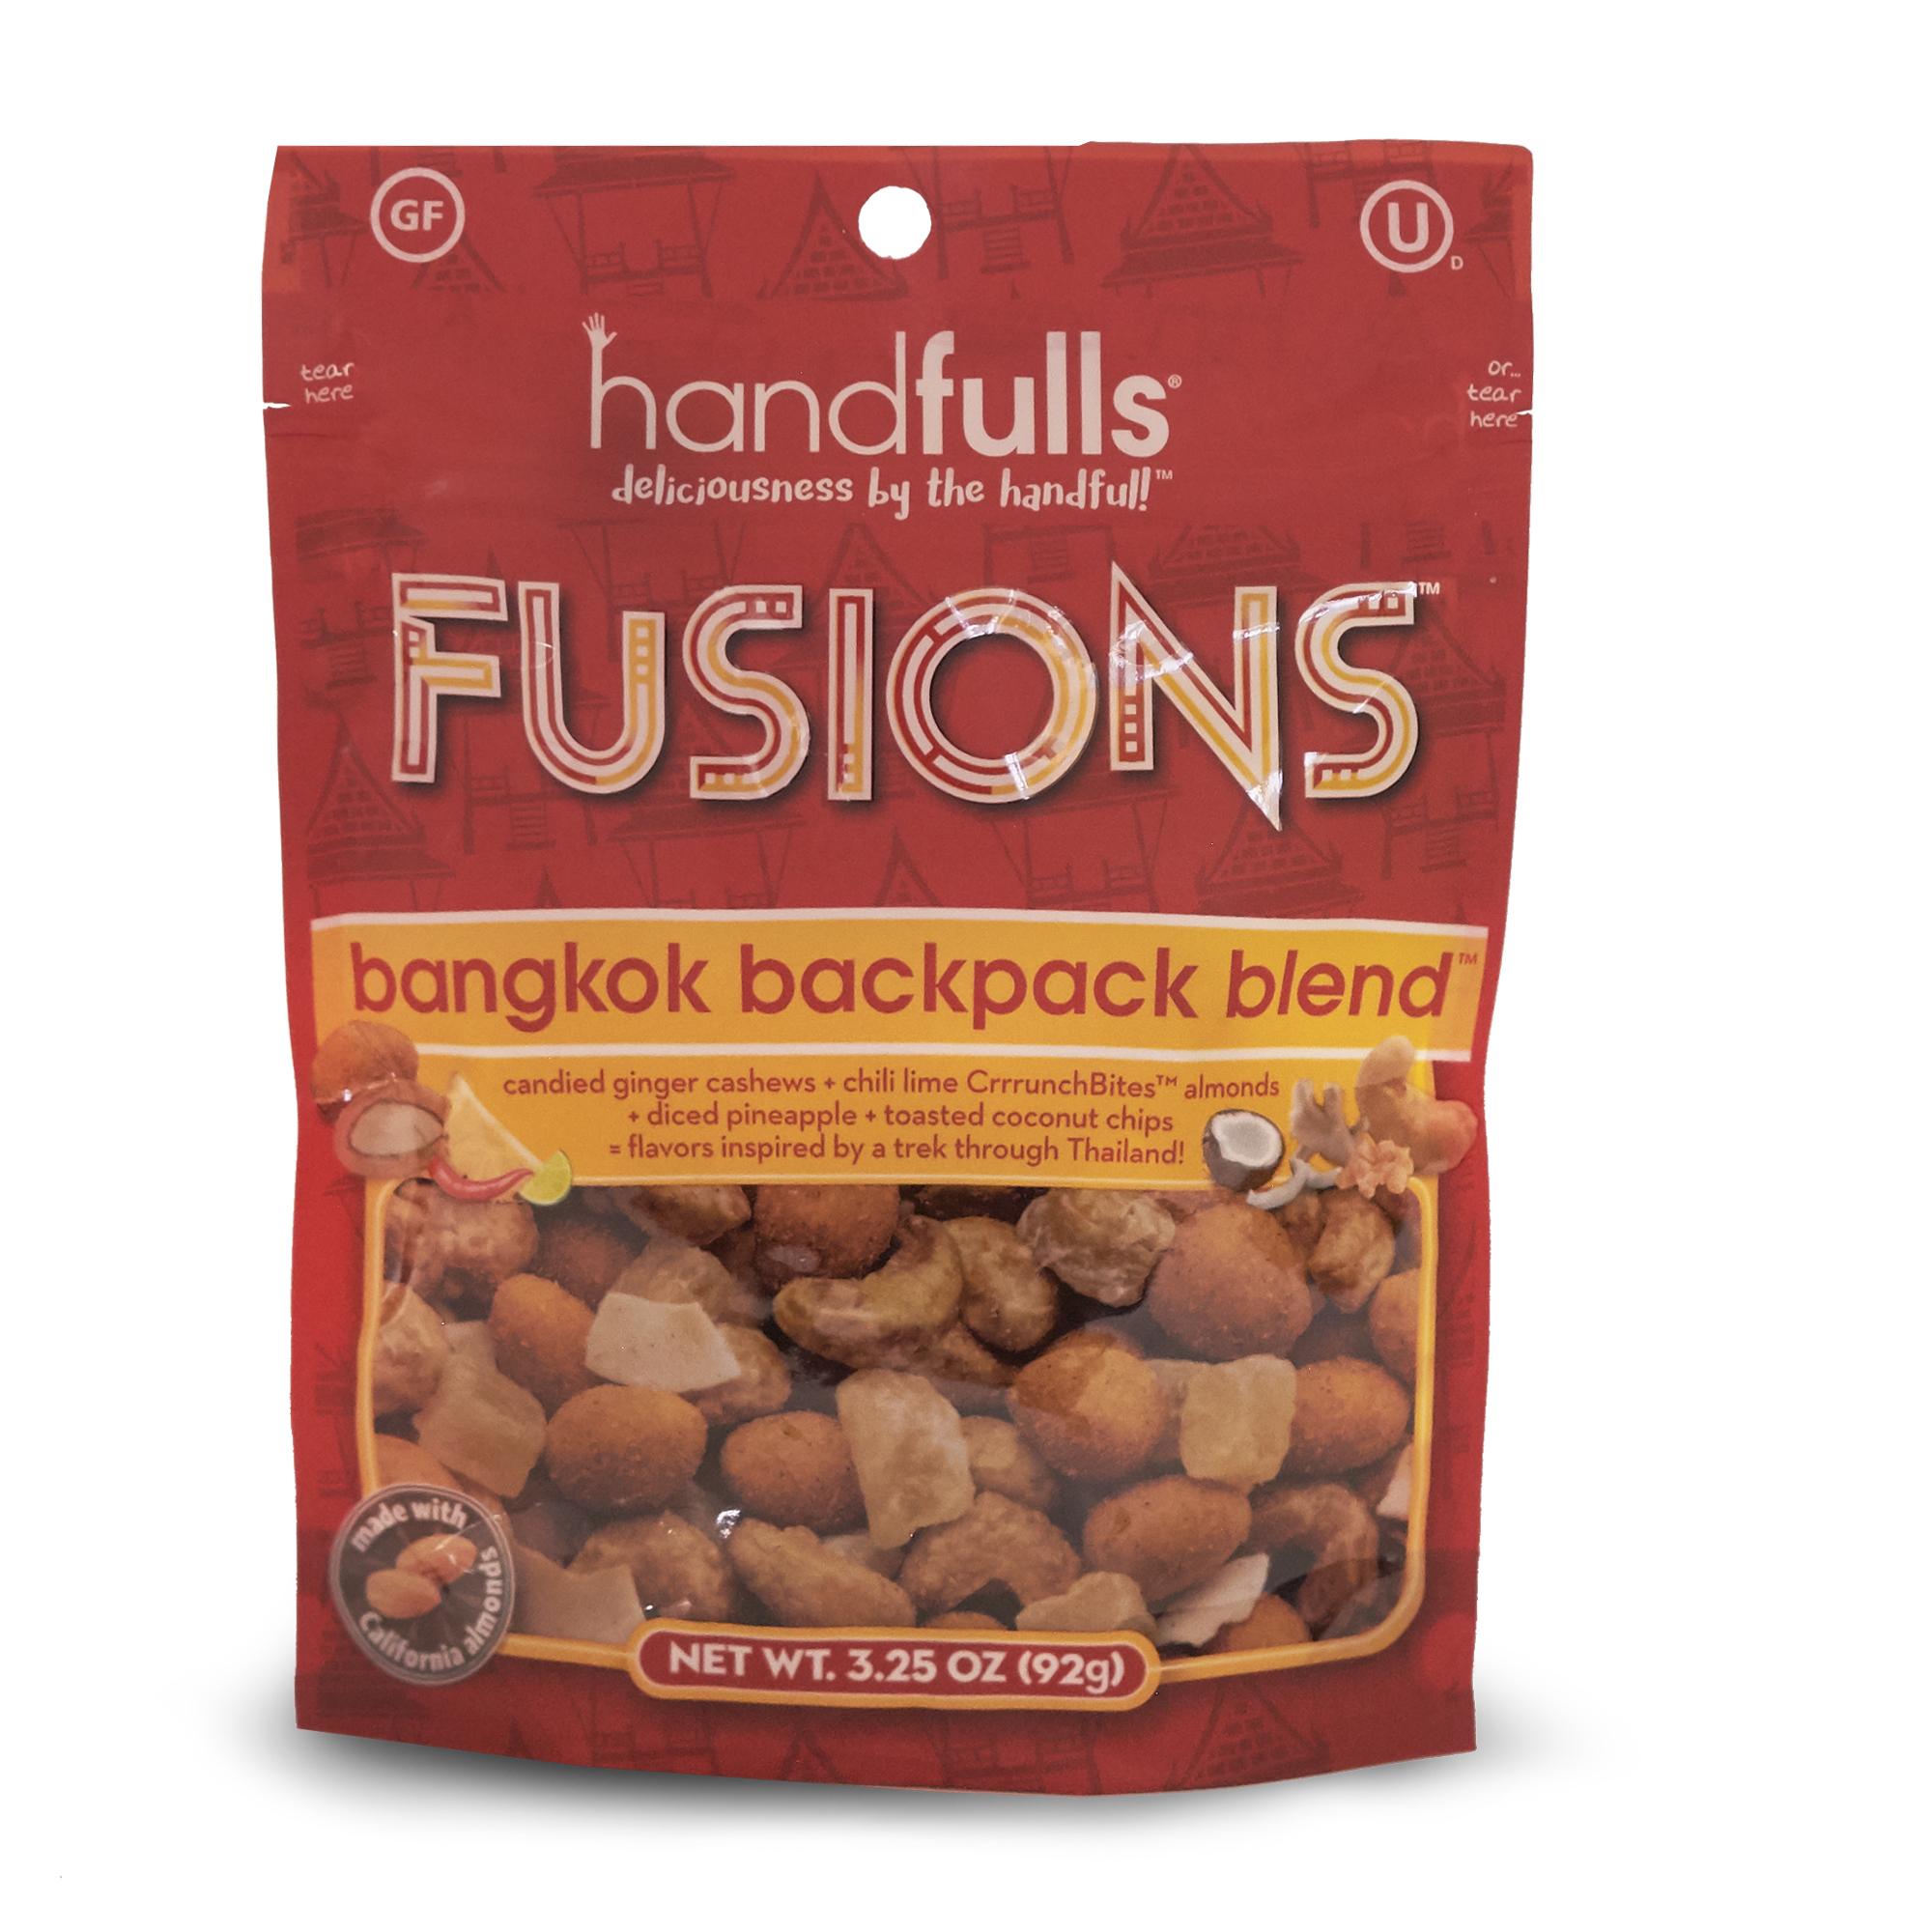 Fusions Bangkok Backpack Blend